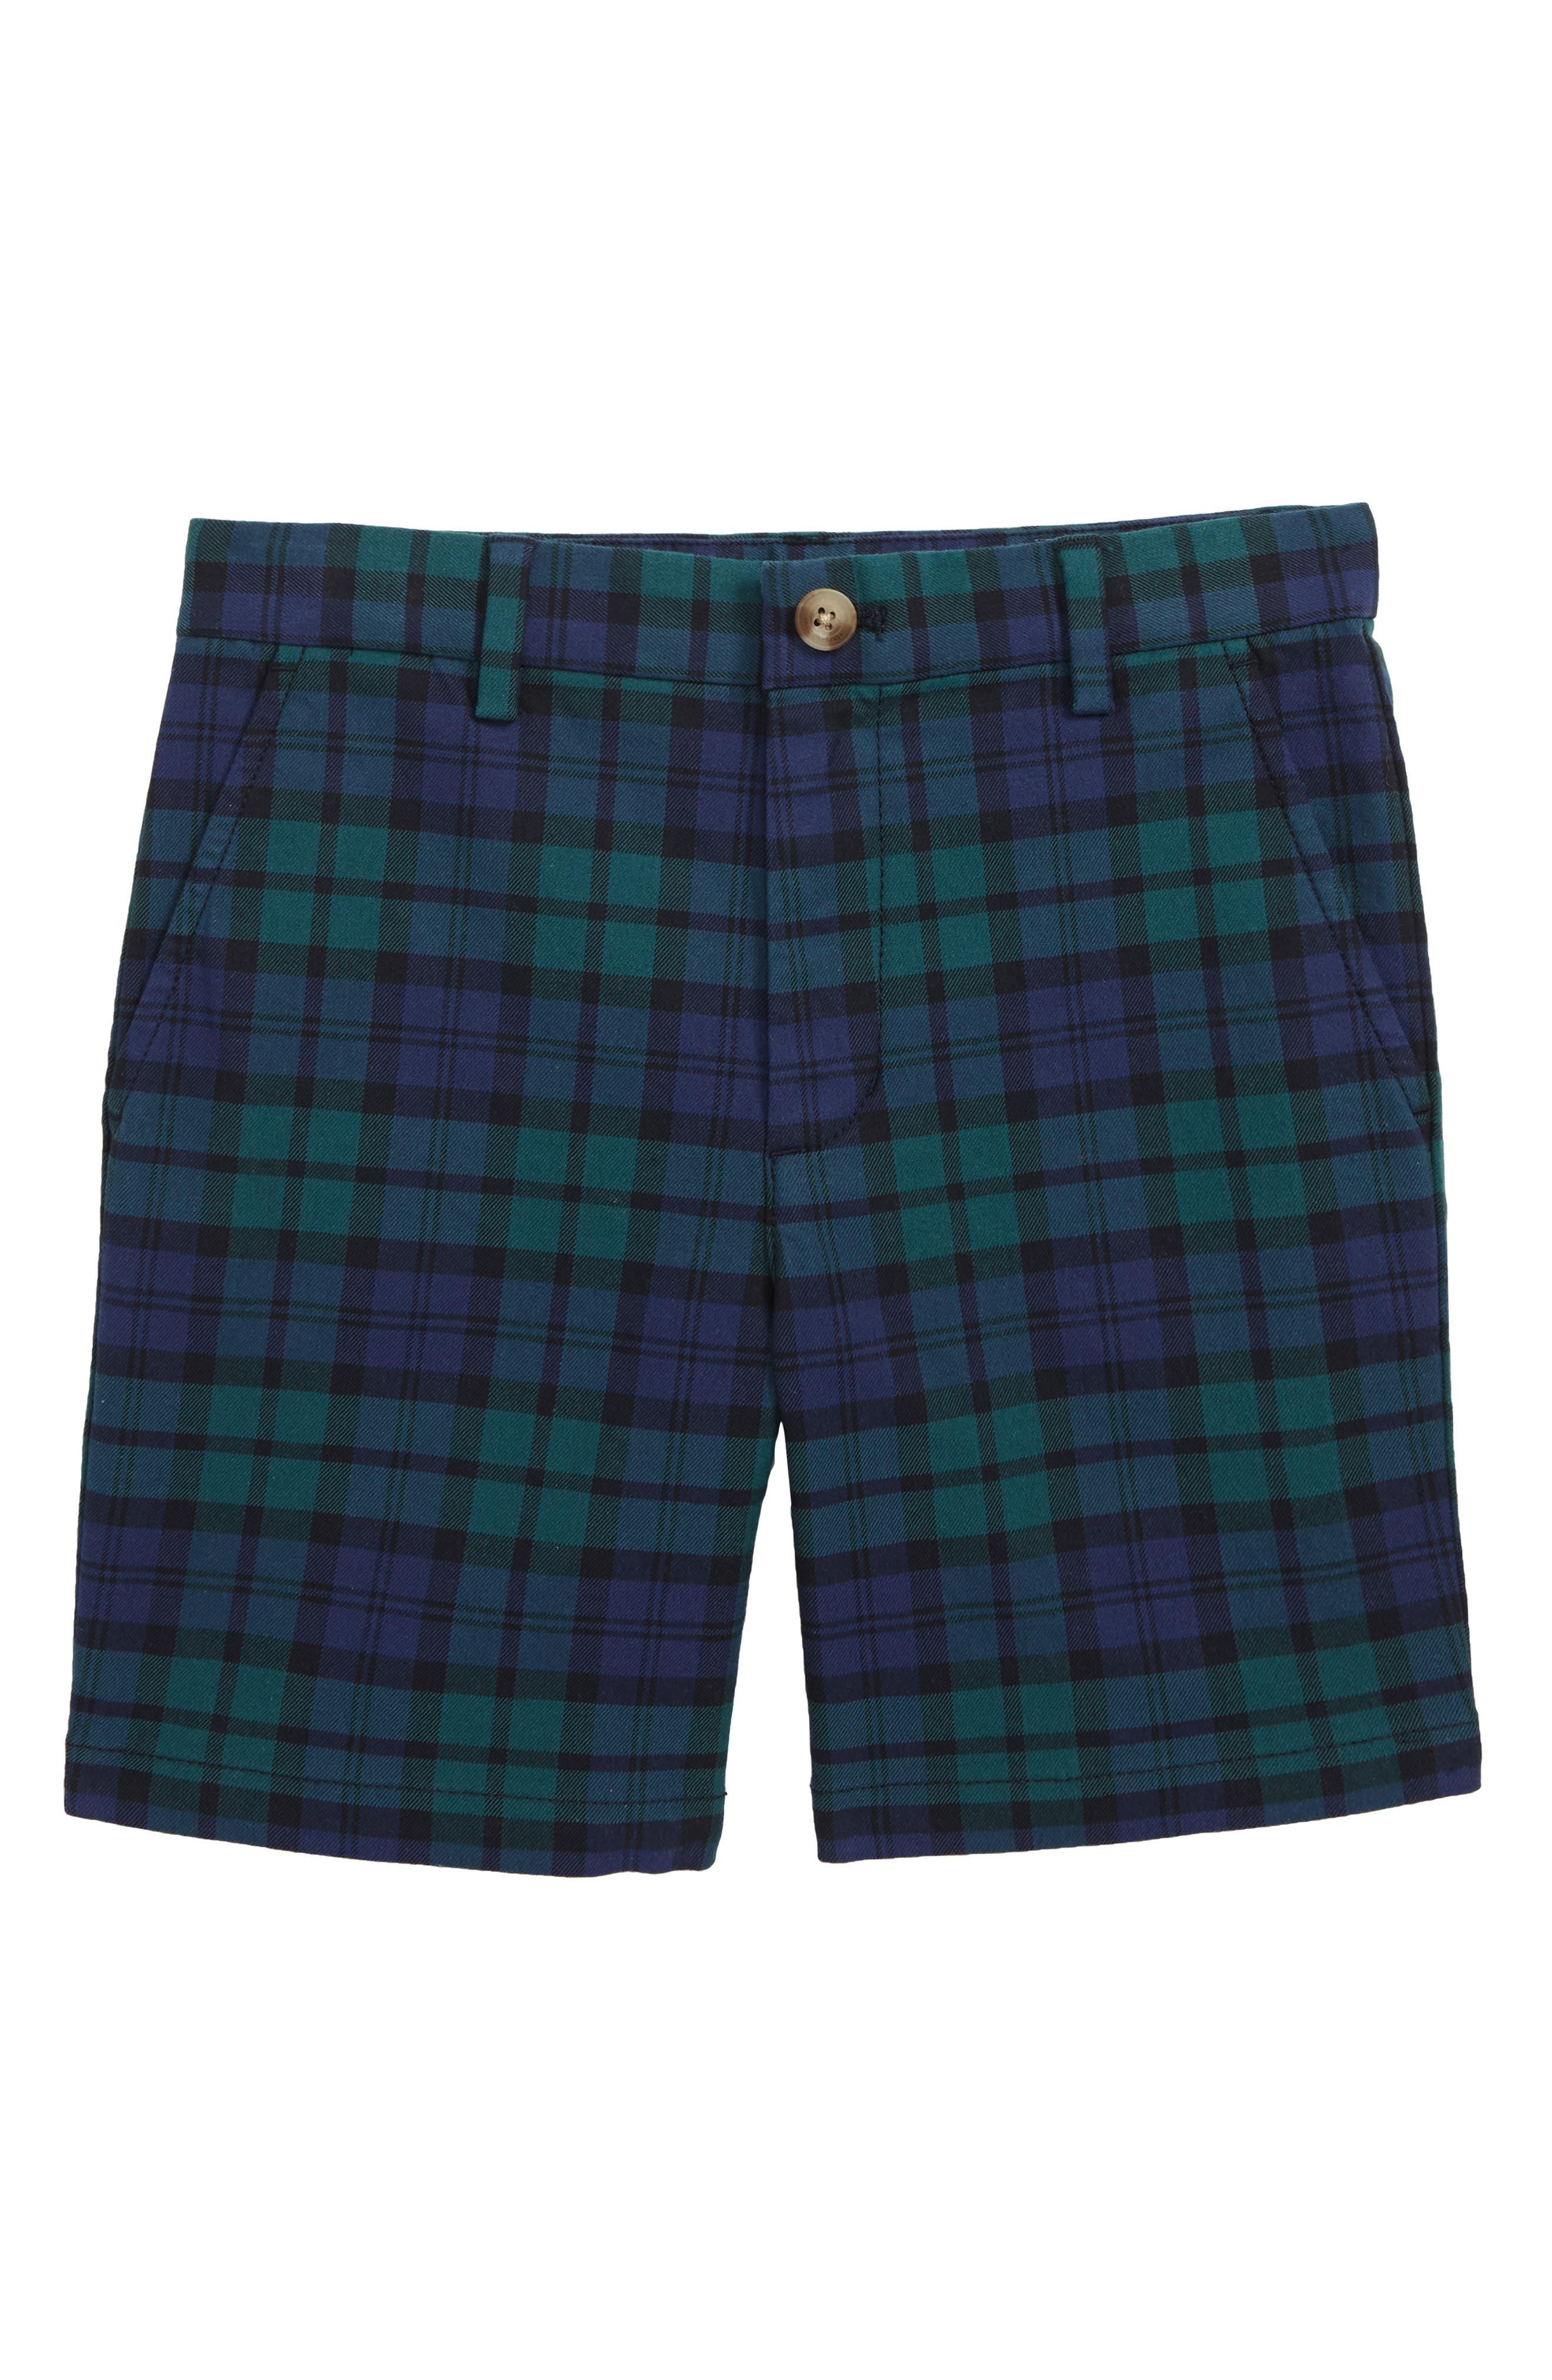 Blackwatch Breaker Shorts,                             Main thumbnail 1, color,                             DEEP BAY